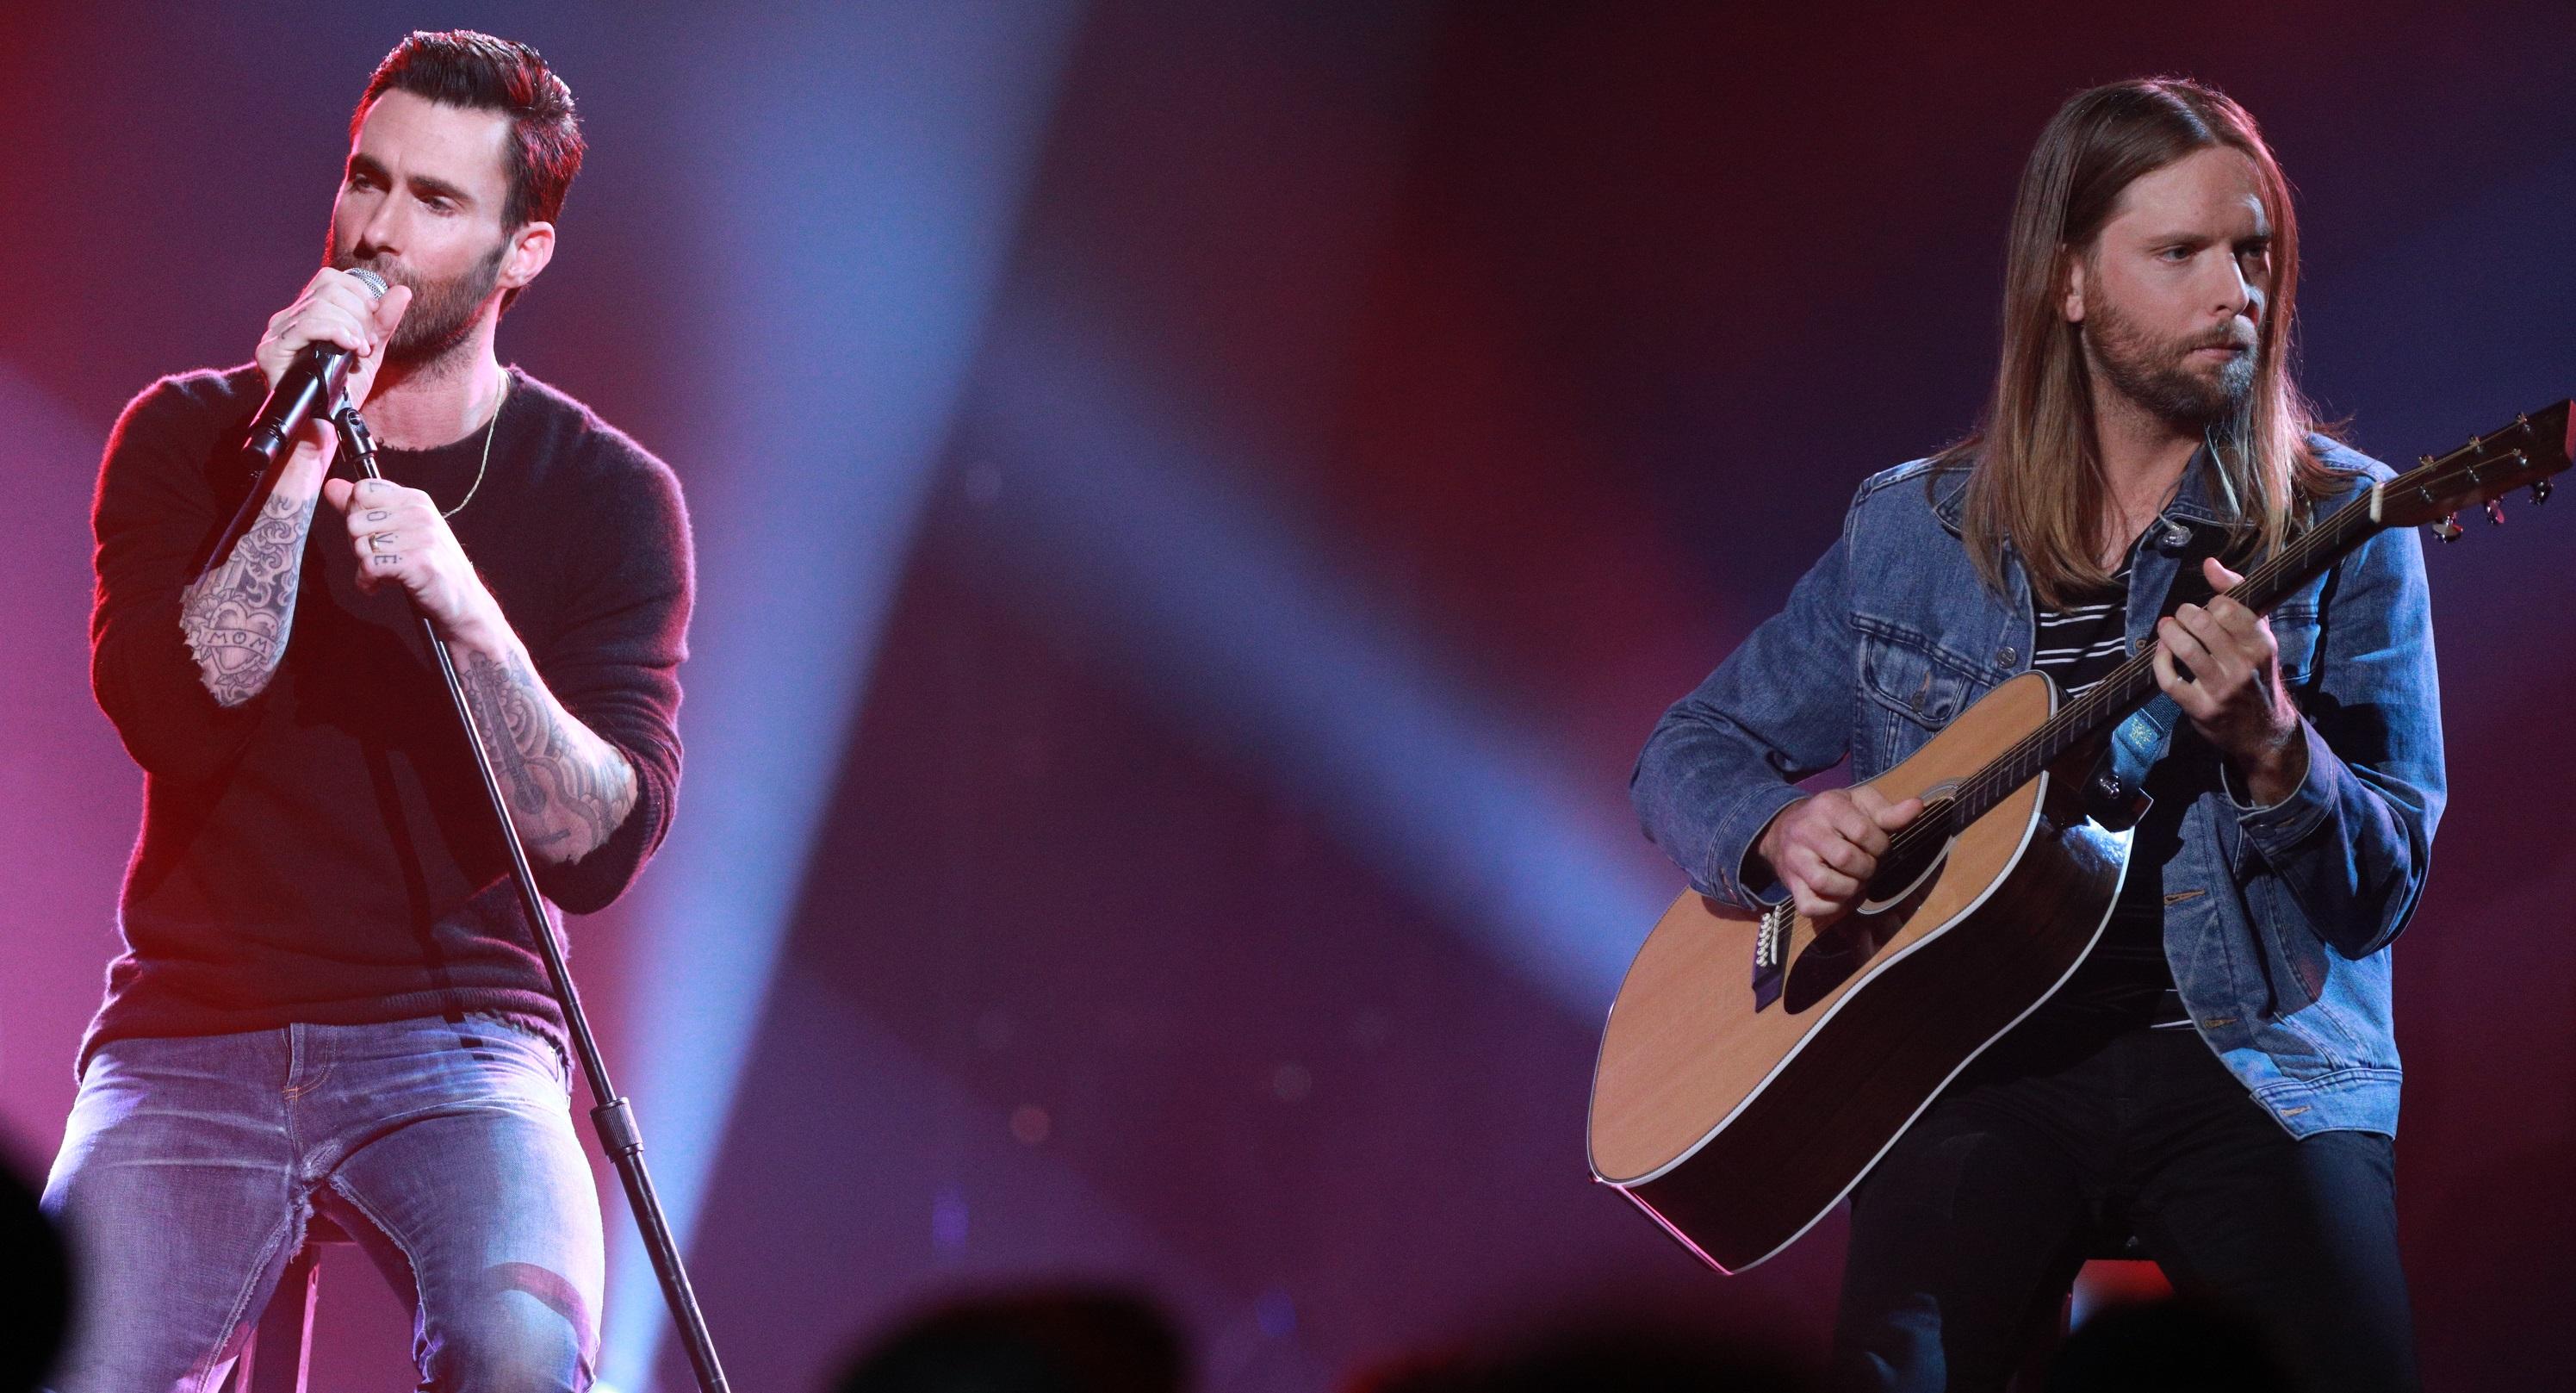 Prestes a lançar novo álbum, Maroon 5 divulga música inédita; vem ouvir 'Wait'!